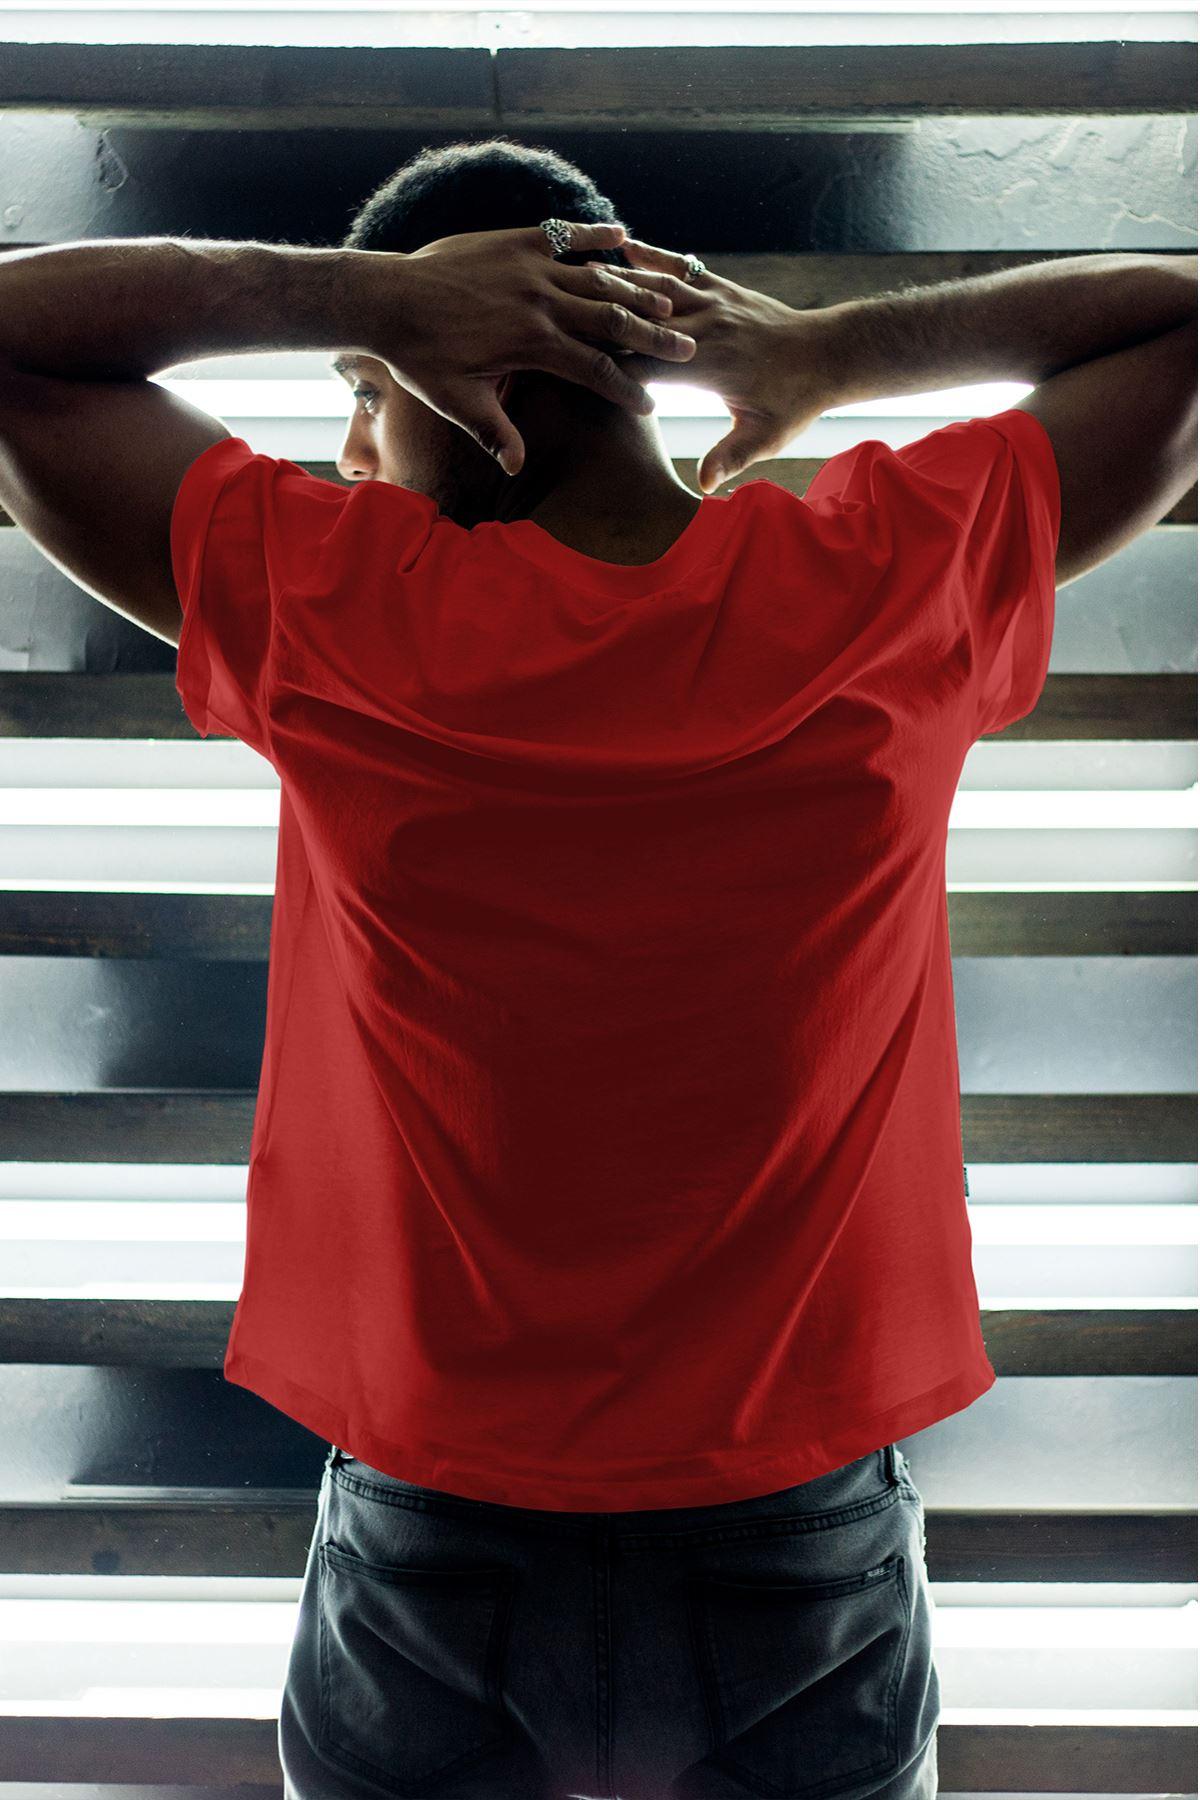 Chicago Bulls 38 Kırmızı Erkek Oversize Tshirt - Tişört